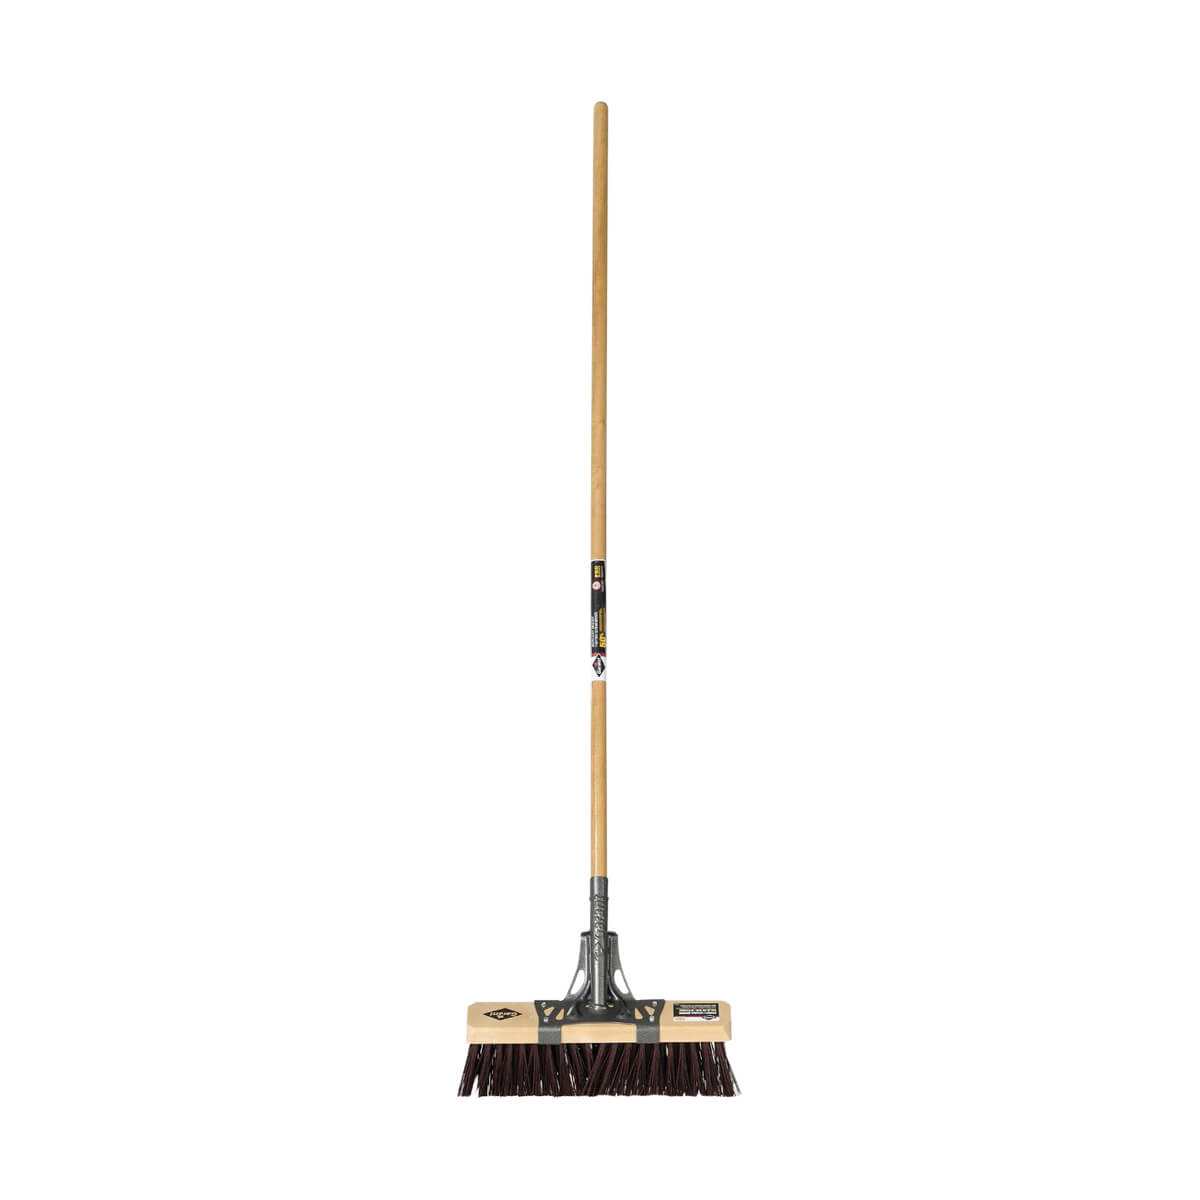 16'' Garant Broom Stiff PRO